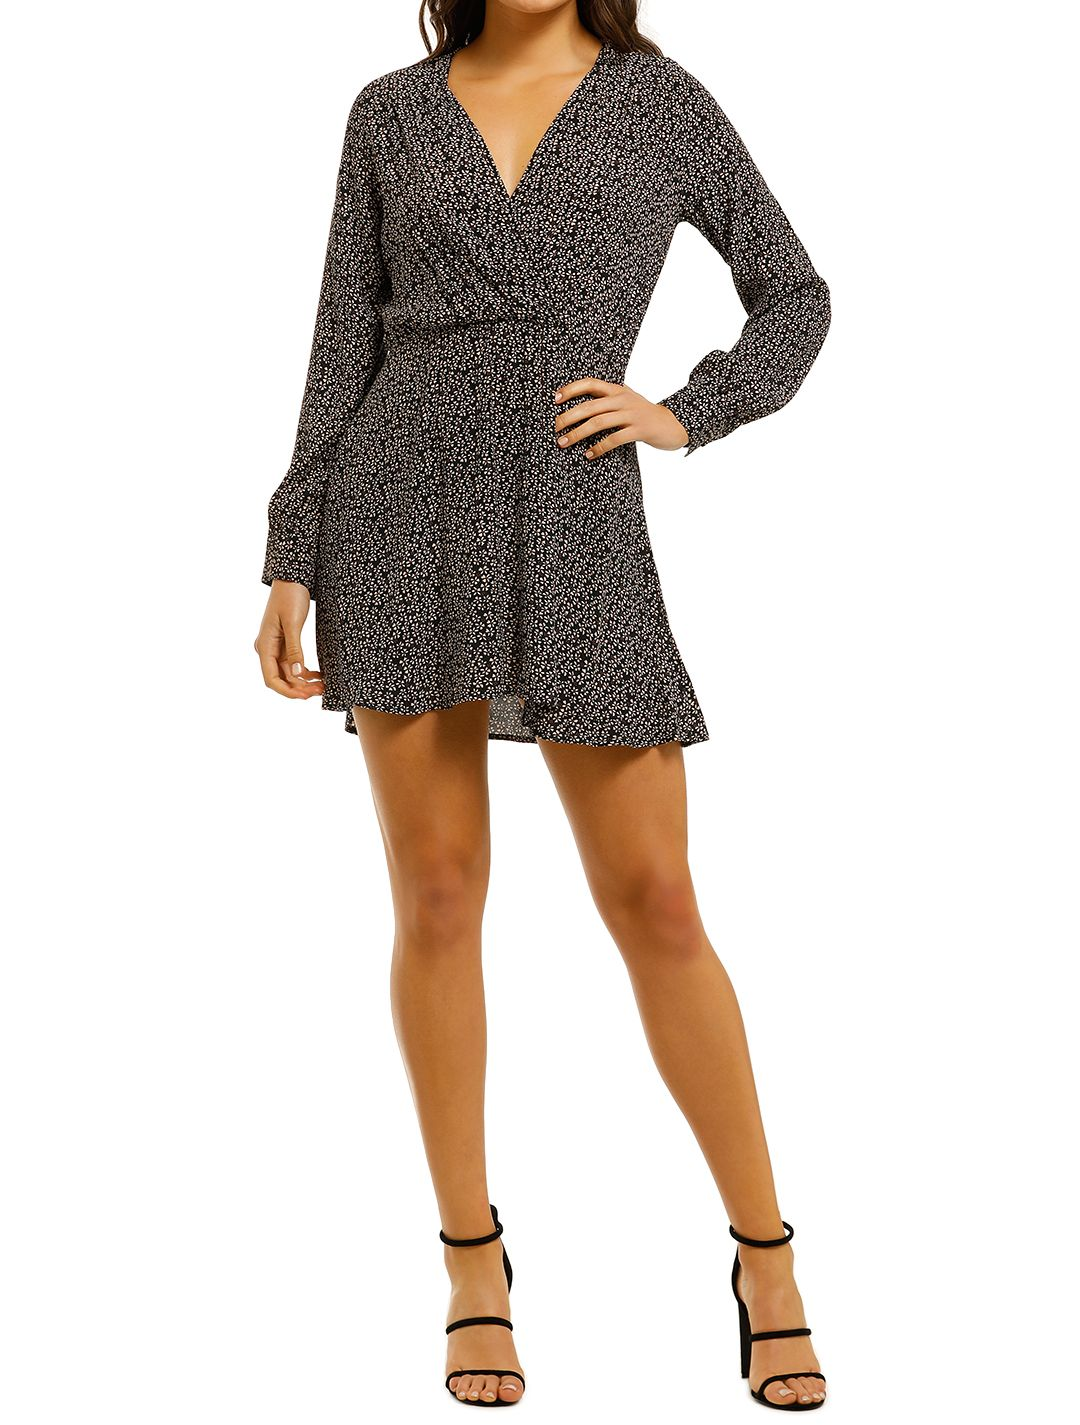 Flynn-Skye-Elle-Mini-Dress-Blush-Petals-Front